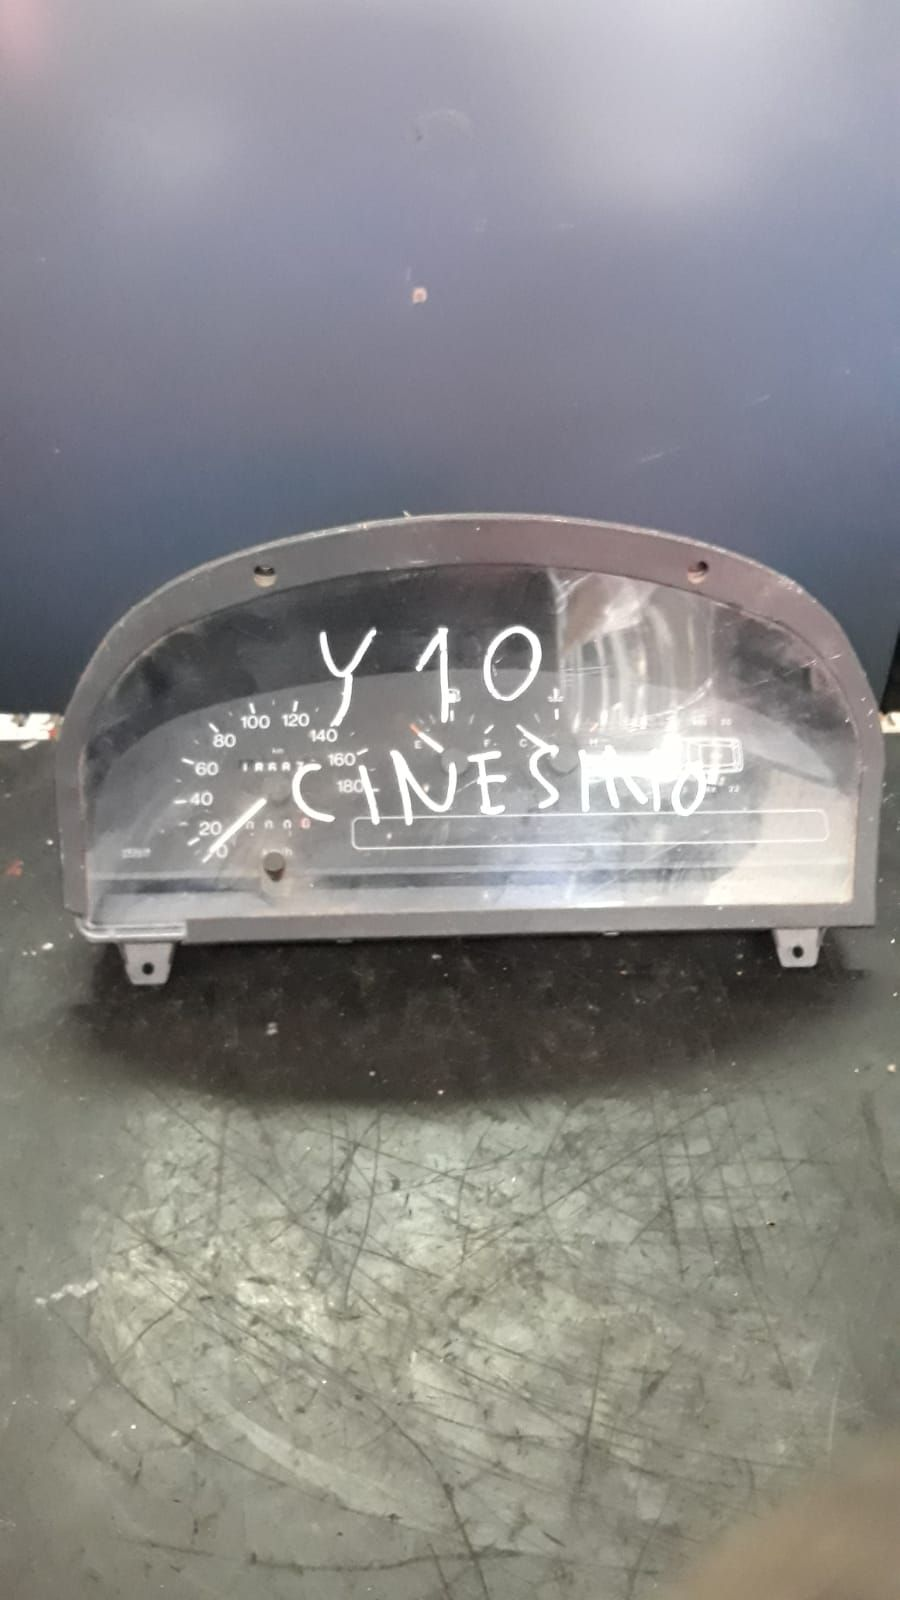 CONTACHILOMETRI AUTOBIANCHI Y10 2° Serie Benzina  RICAMBI USATI